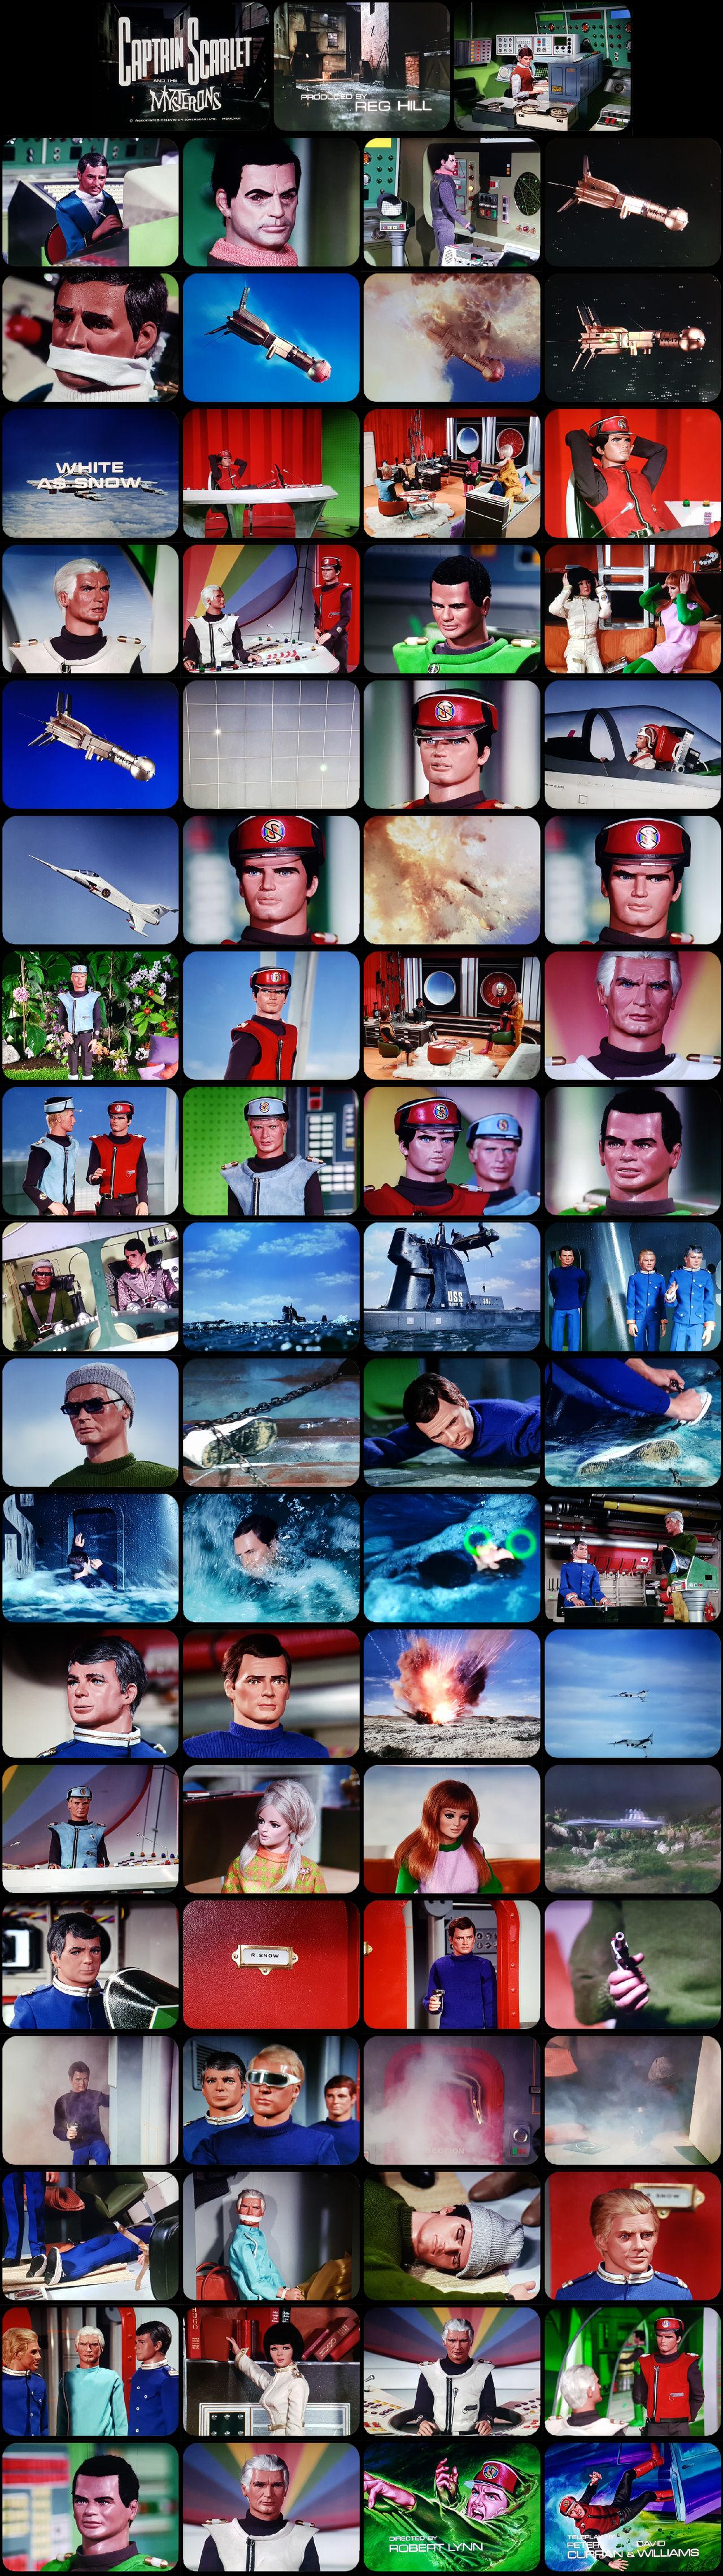 Captain Scarlet Episode 8 Tele-Snaps (REDONE)